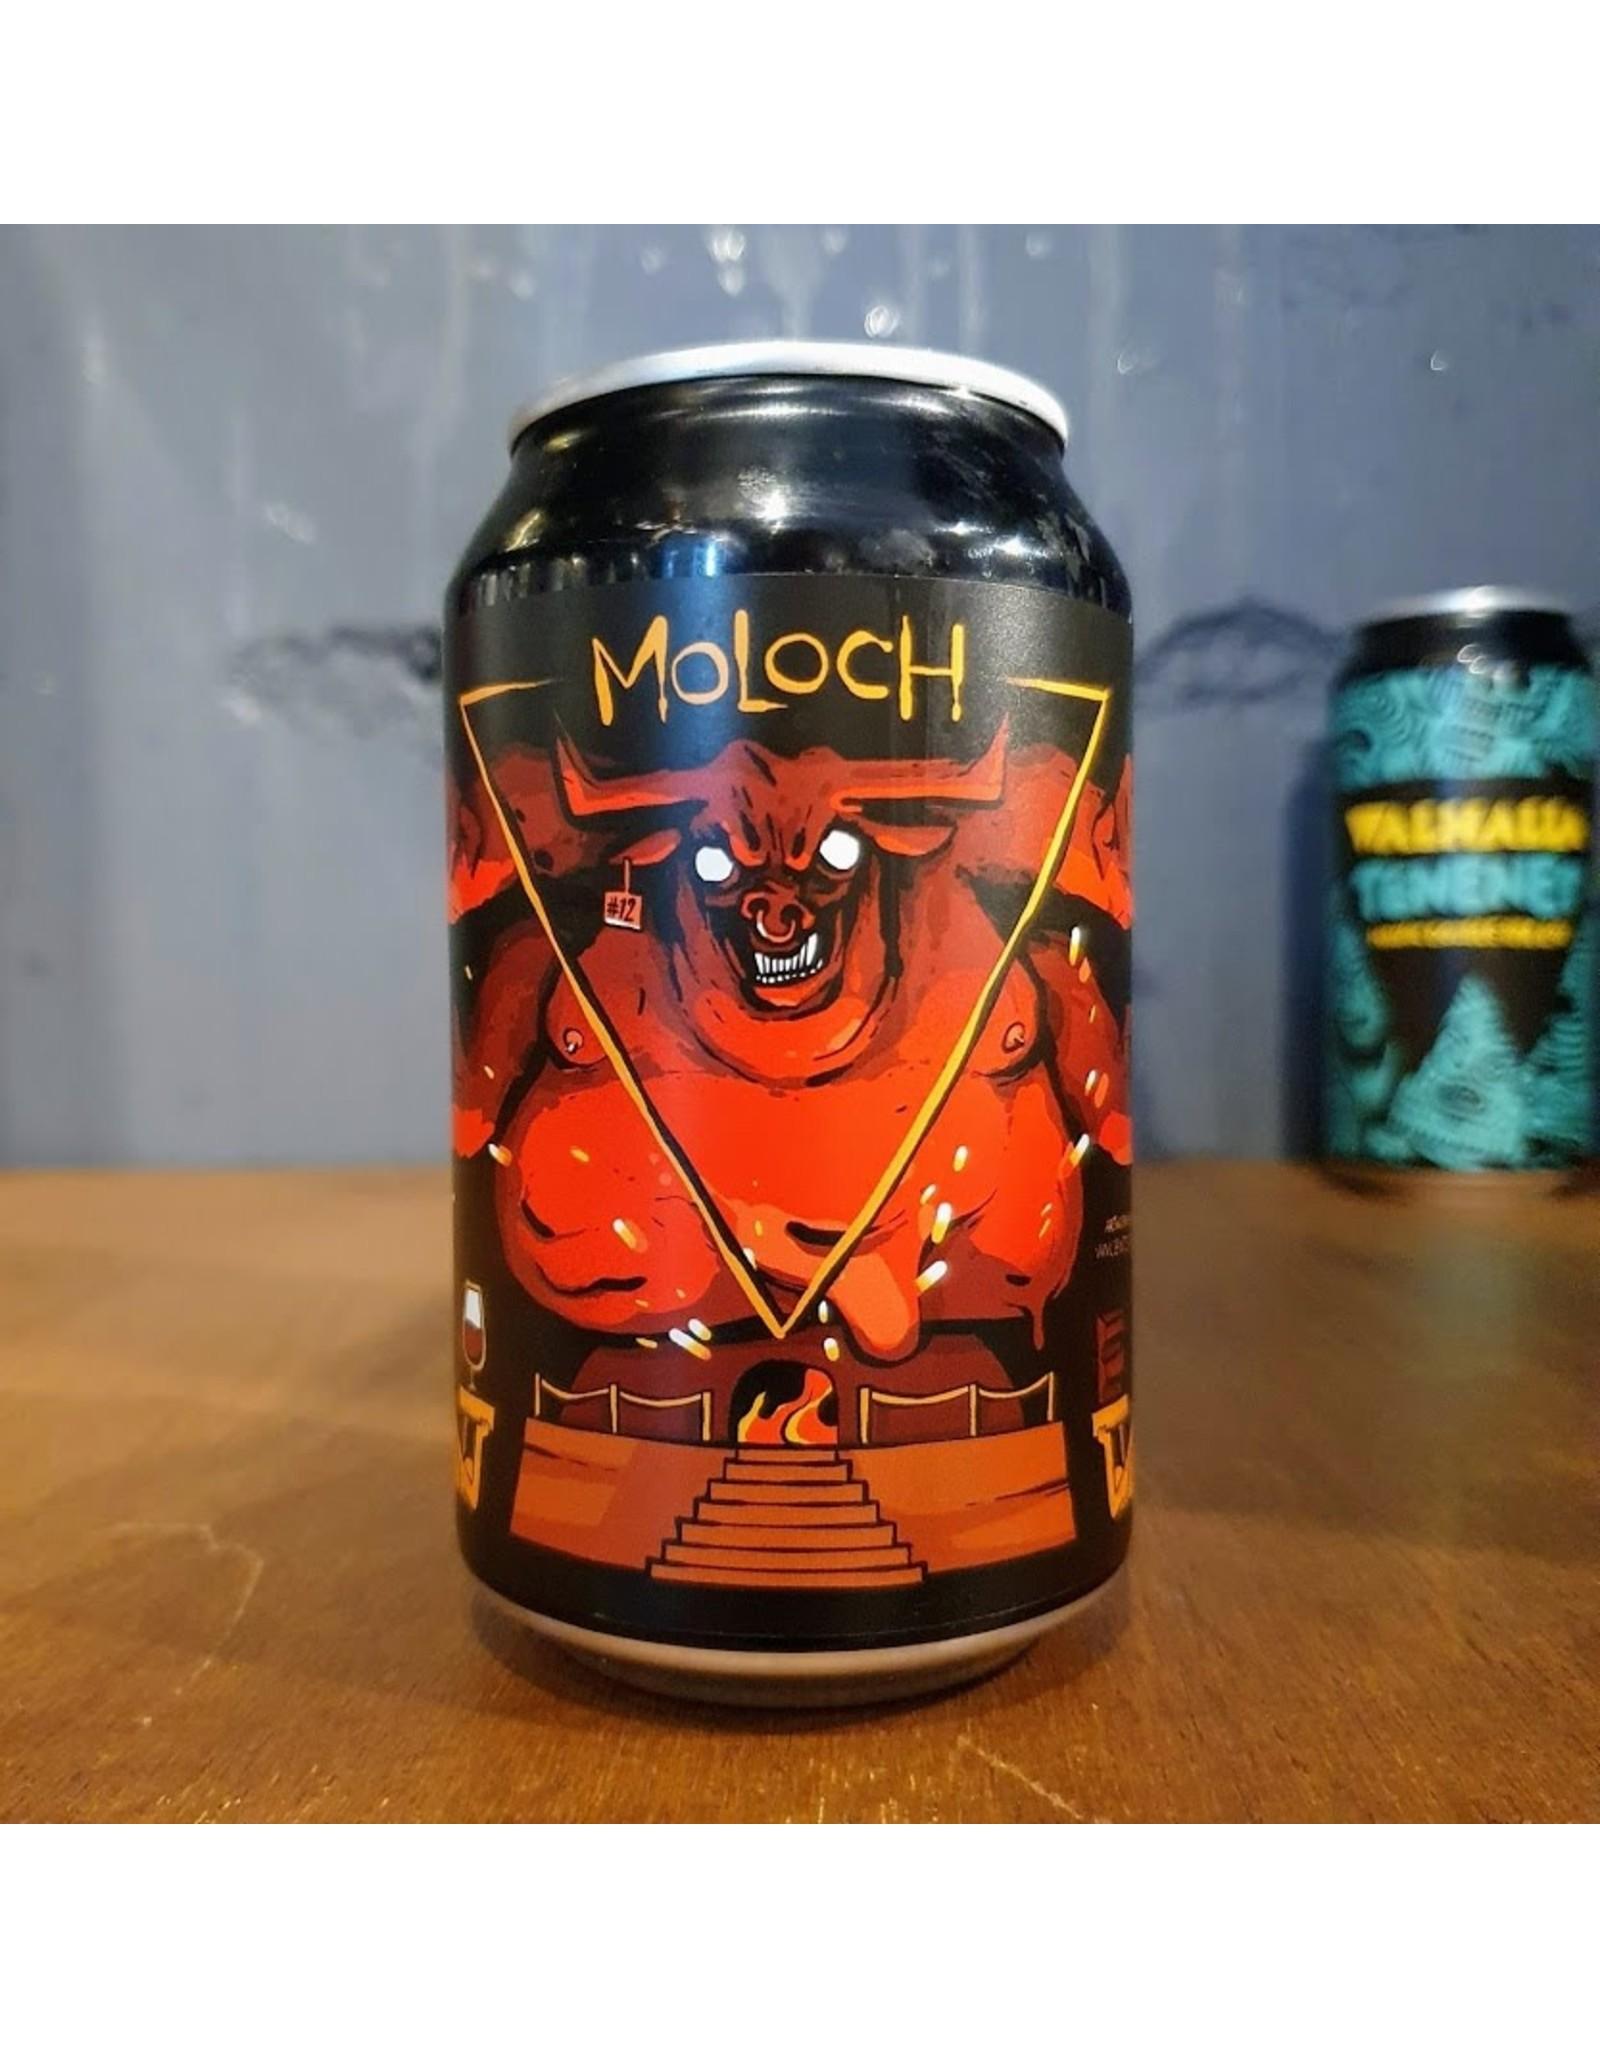 Walhalla Walhalla: Daemon #12 Moloch